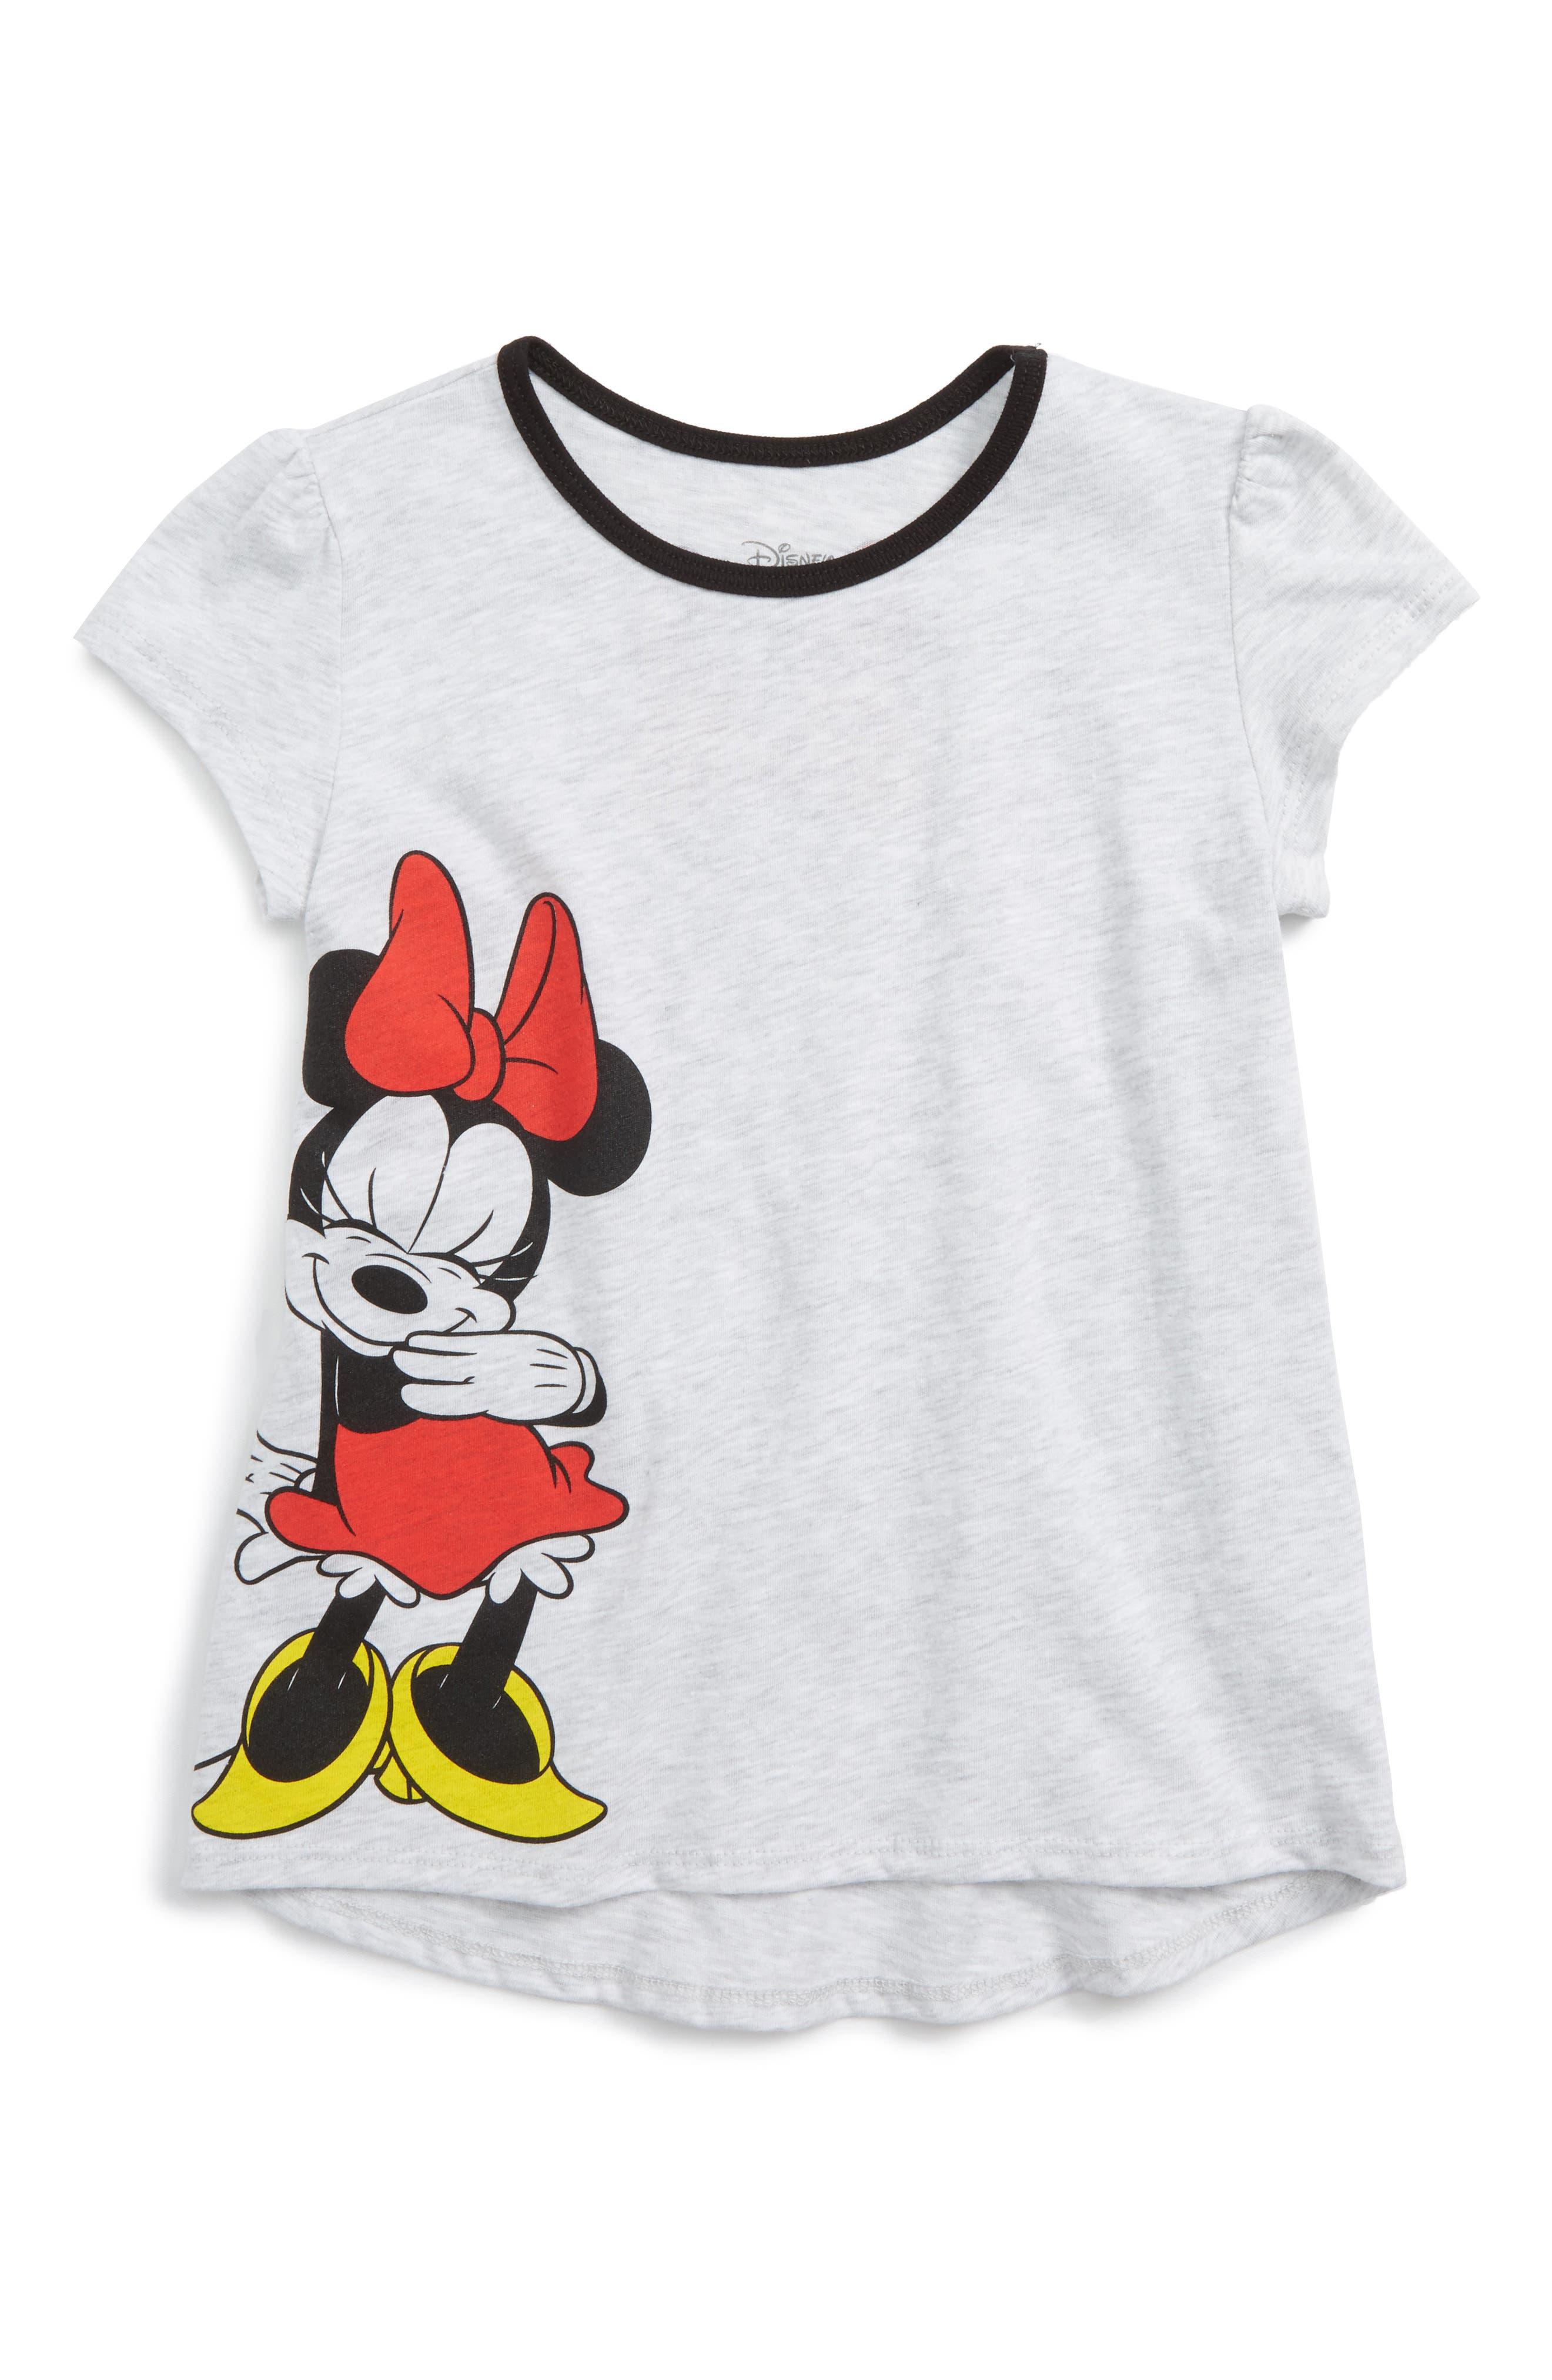 Disney - Minnie Mouse Graphic Tee,                             Main thumbnail 1, color,                             Ash Heather / Black